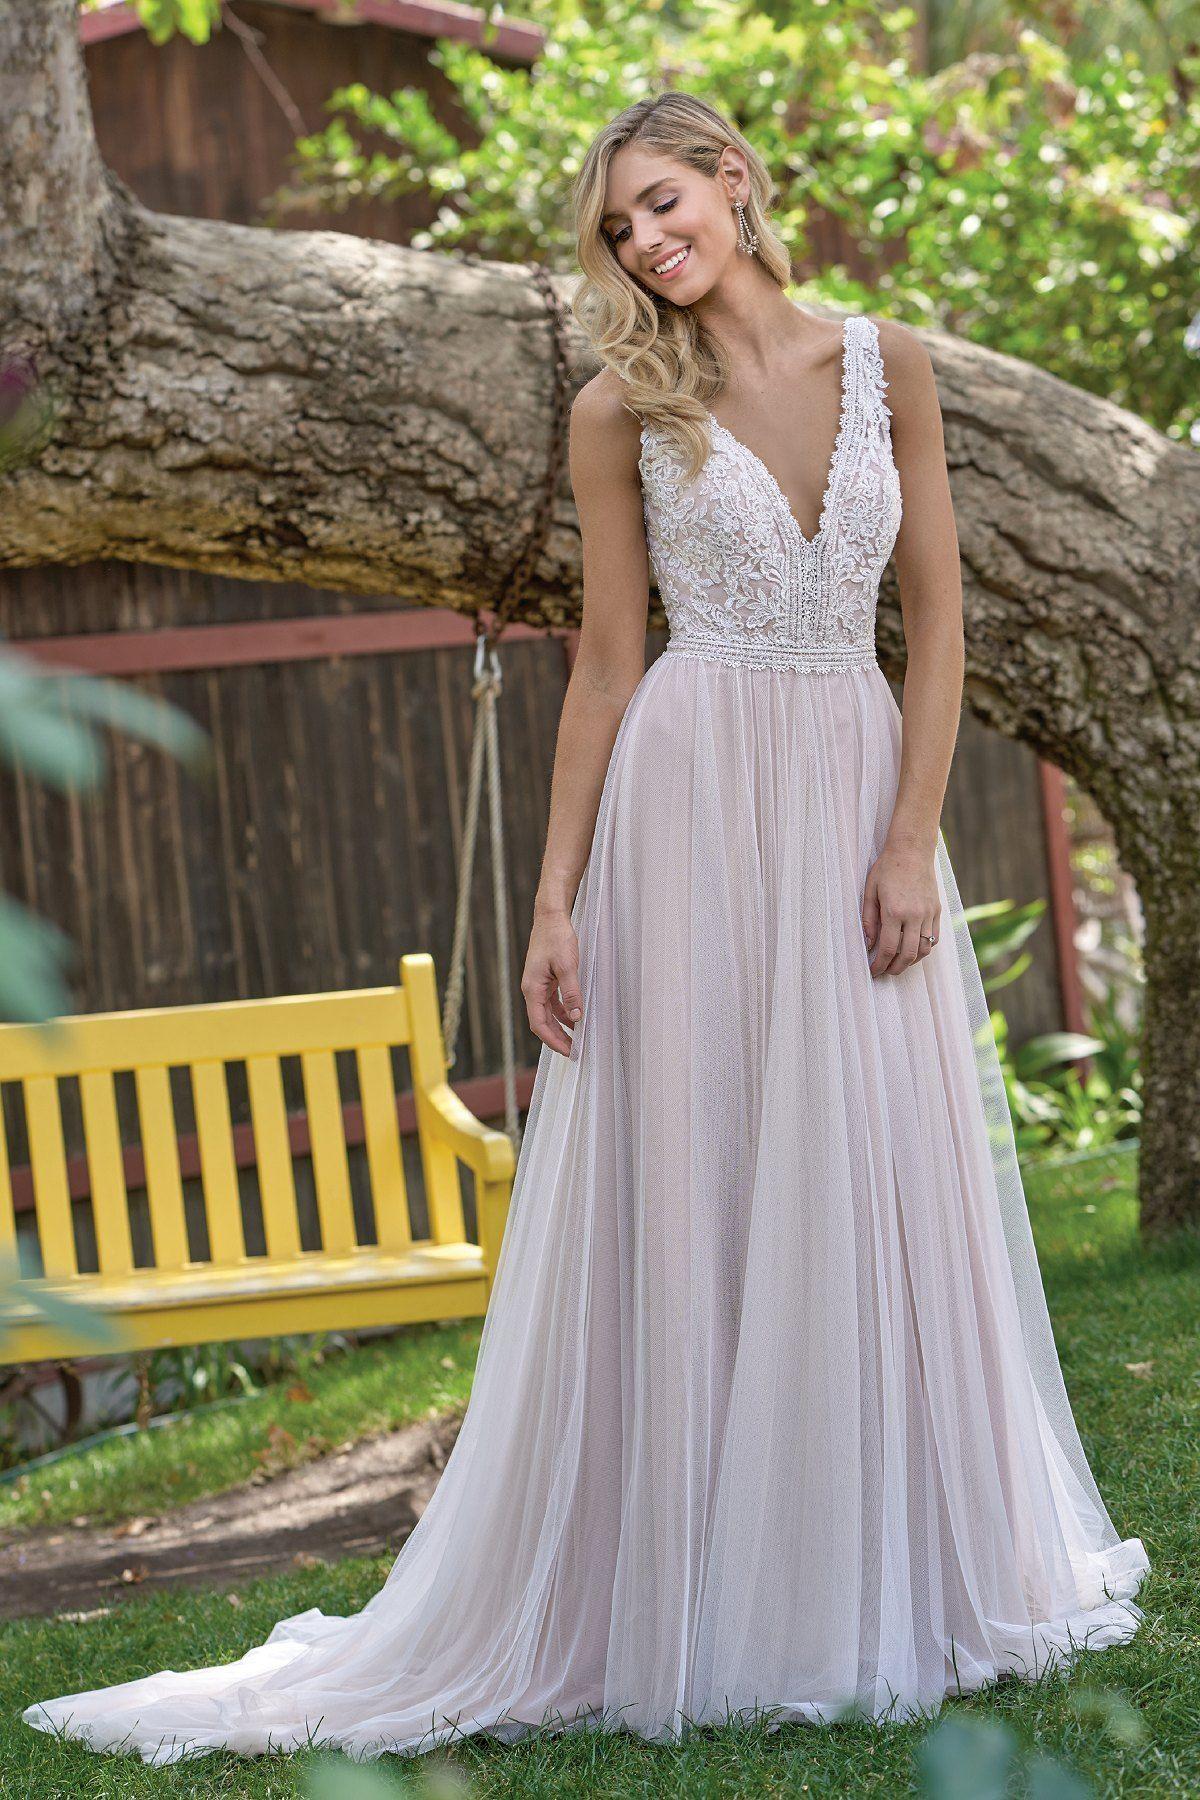 a42cb0c1a7 Jasmine Collection at Amara Bridal Boutique of Cincinnati